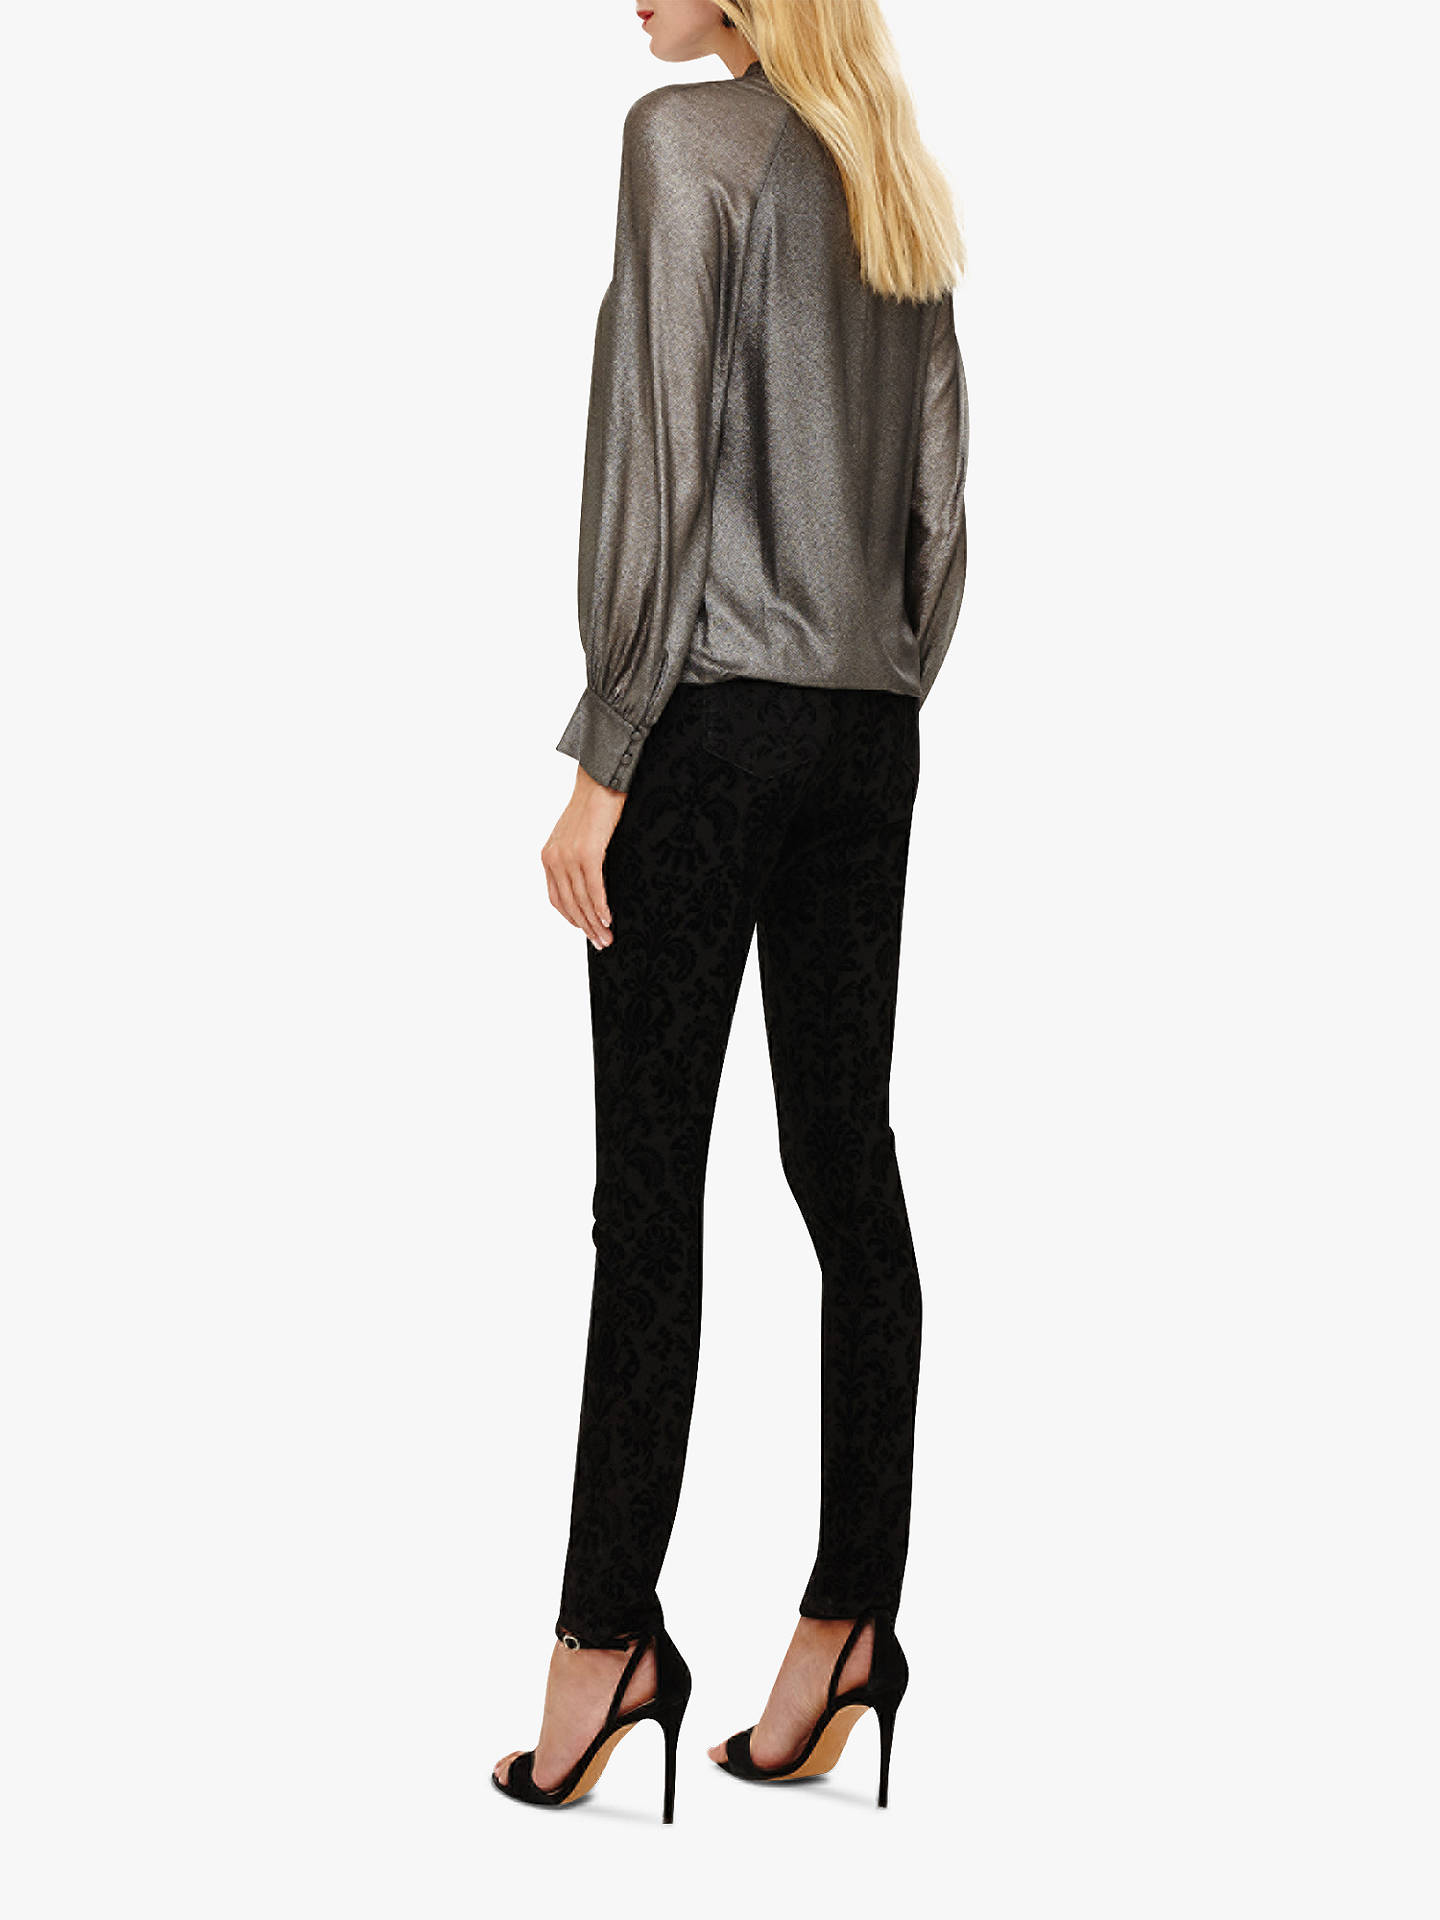 c4ffb8c7b2 ... Buy Phase Eight Flocked Floral Skinny Jeans, Black, 12 Online at  johnlewis.com ...